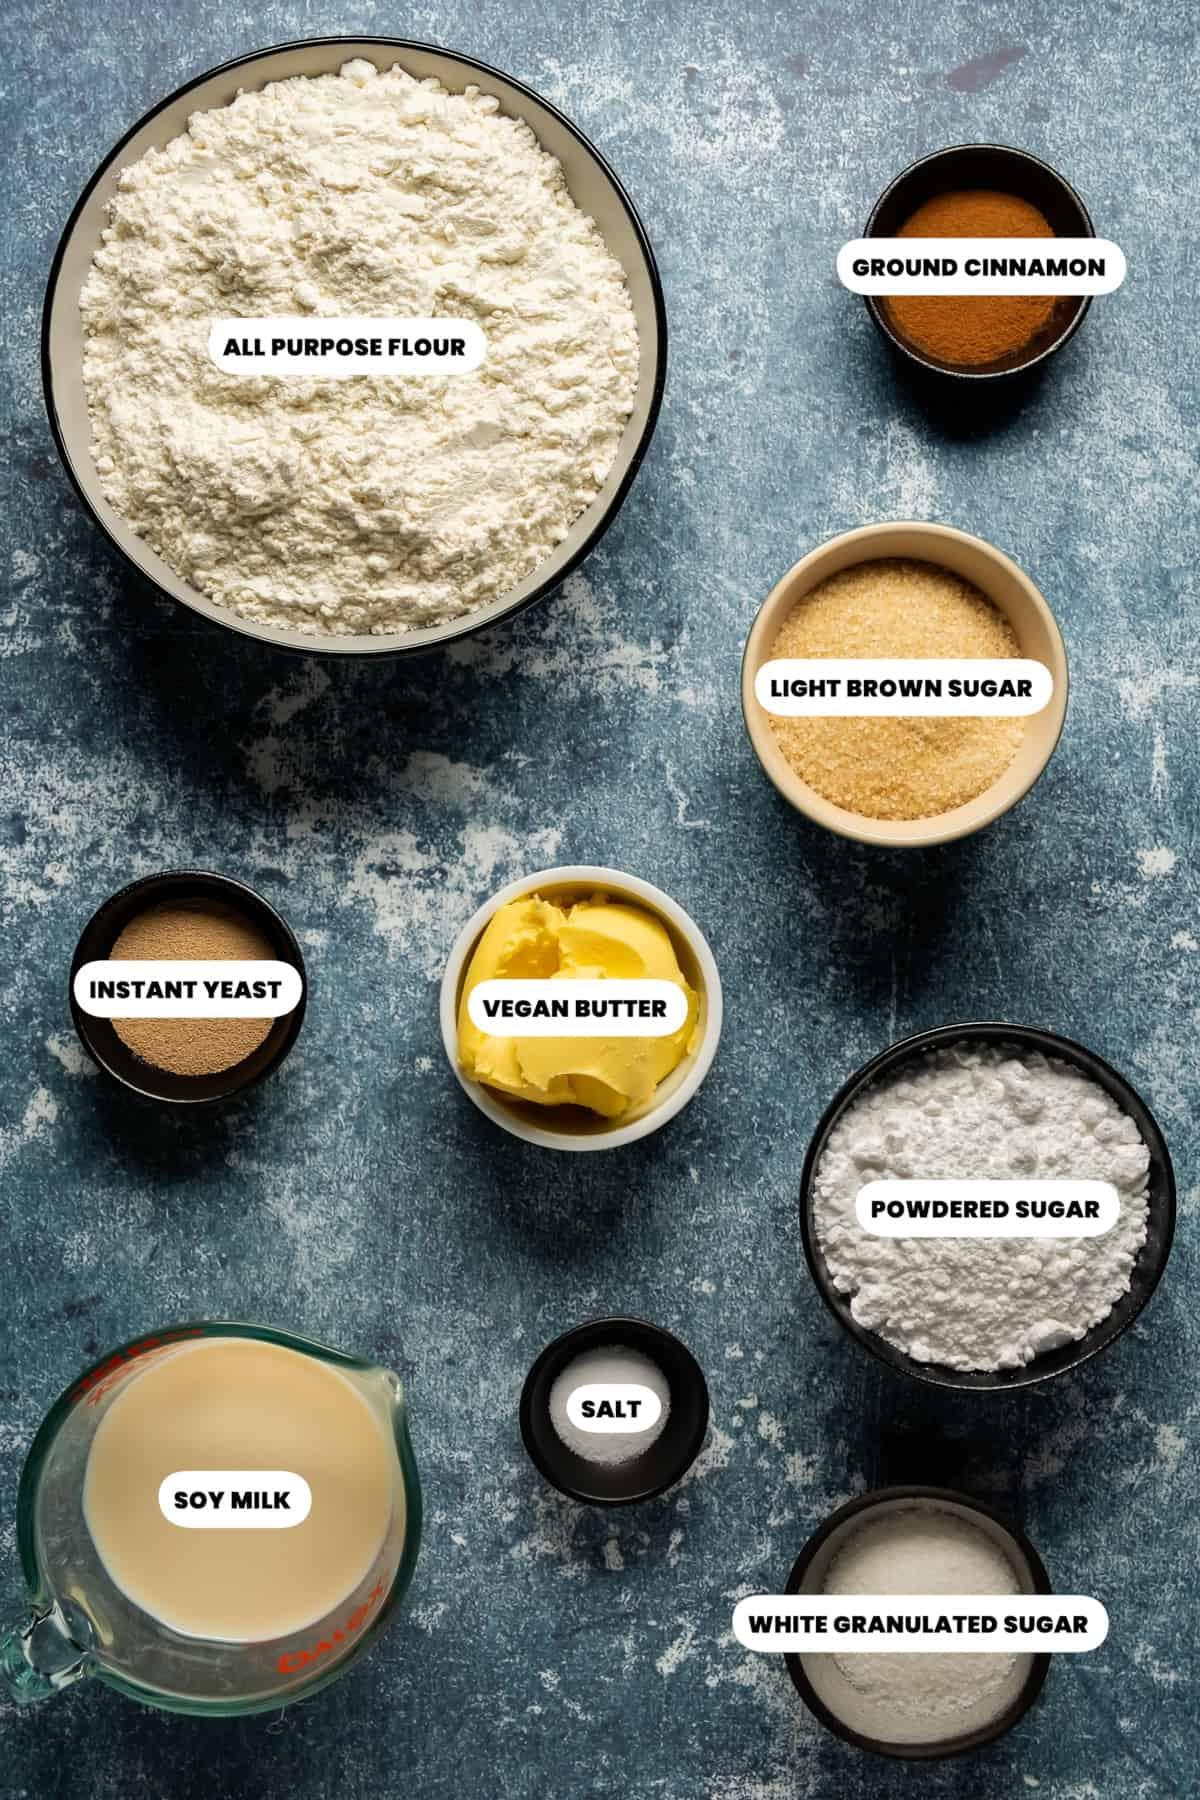 Photo of the ingredients to make vegan cinnamon rolls